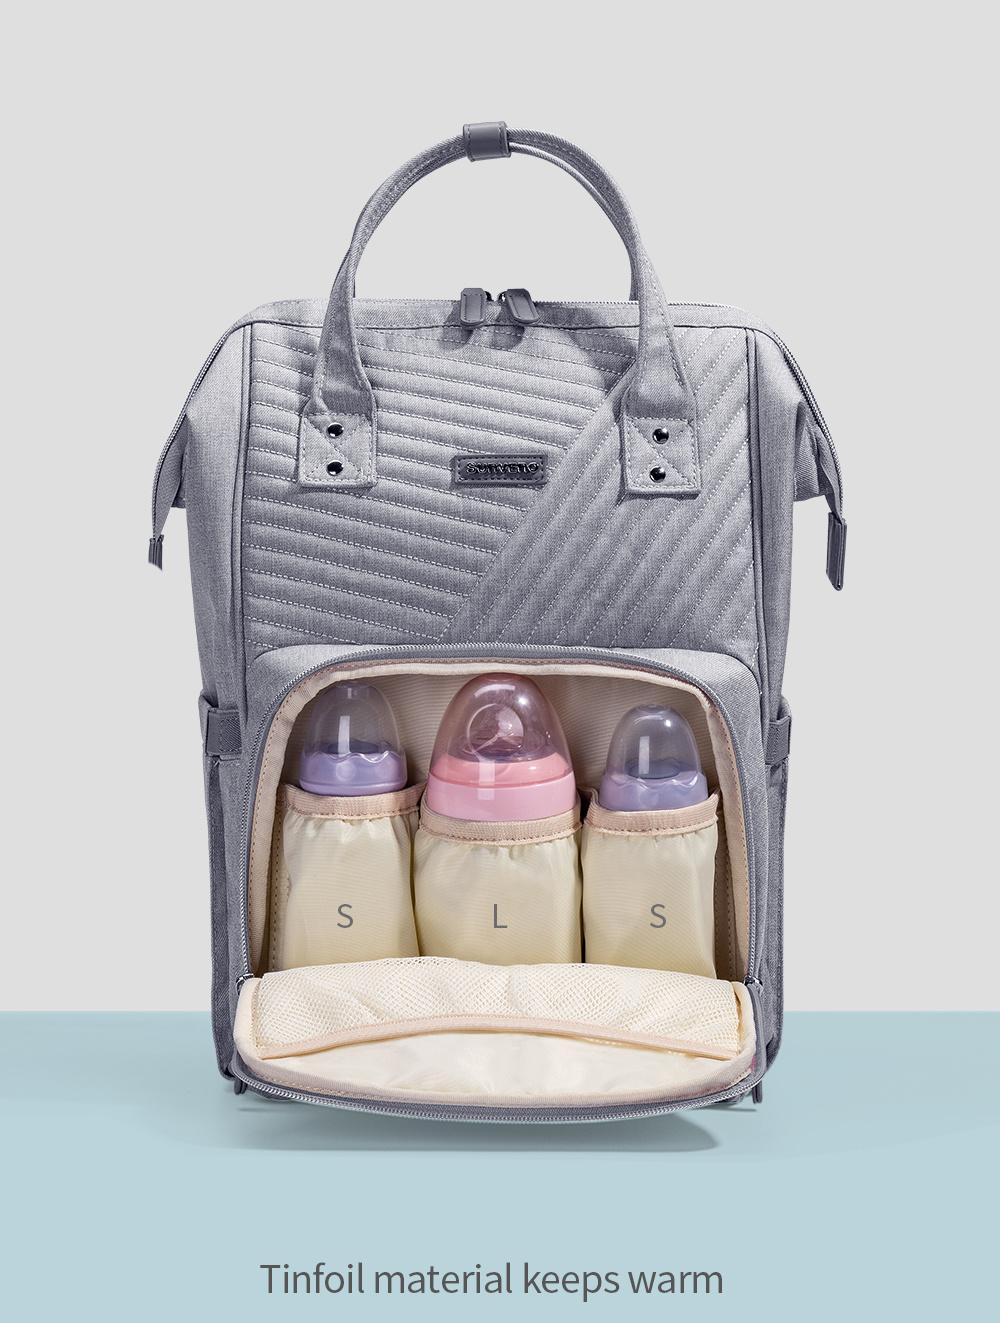 Dropship Sunveno Mochila de moda para pañales Mochila acolchada Grande Mamá Maternidad Bolsa de enfermería Mochila de viaje Cochecito Bolsa de bebé Pañal Cuidado del bebé